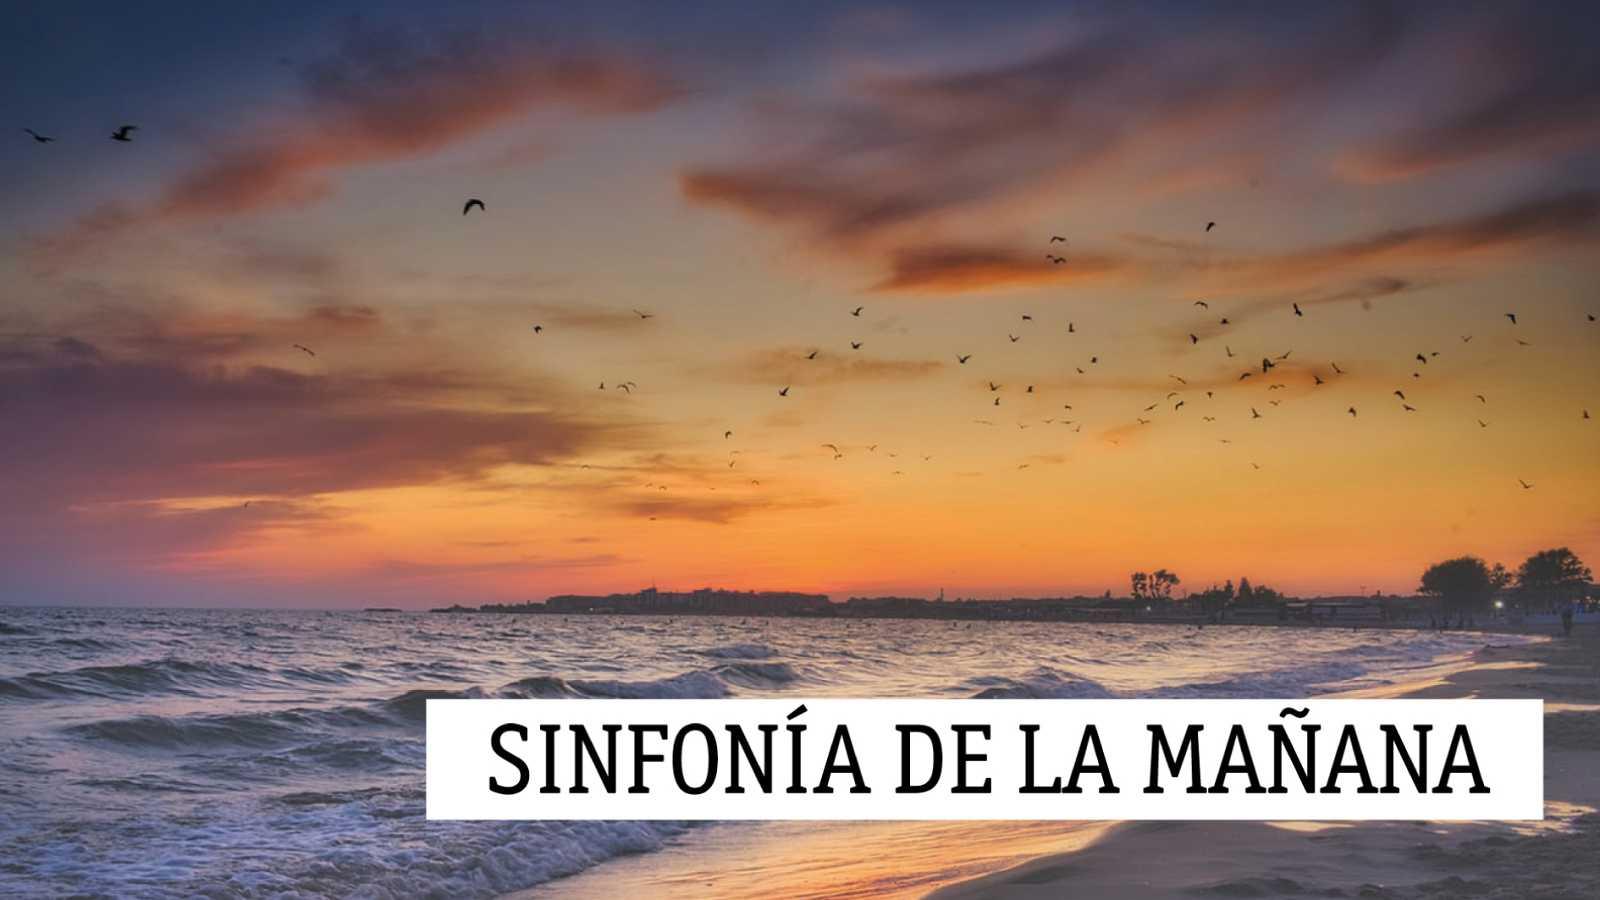 Sinfonía de la mañana - Fidelio: a la tercera va la vencida - 22/10/19 - escuchar ahora